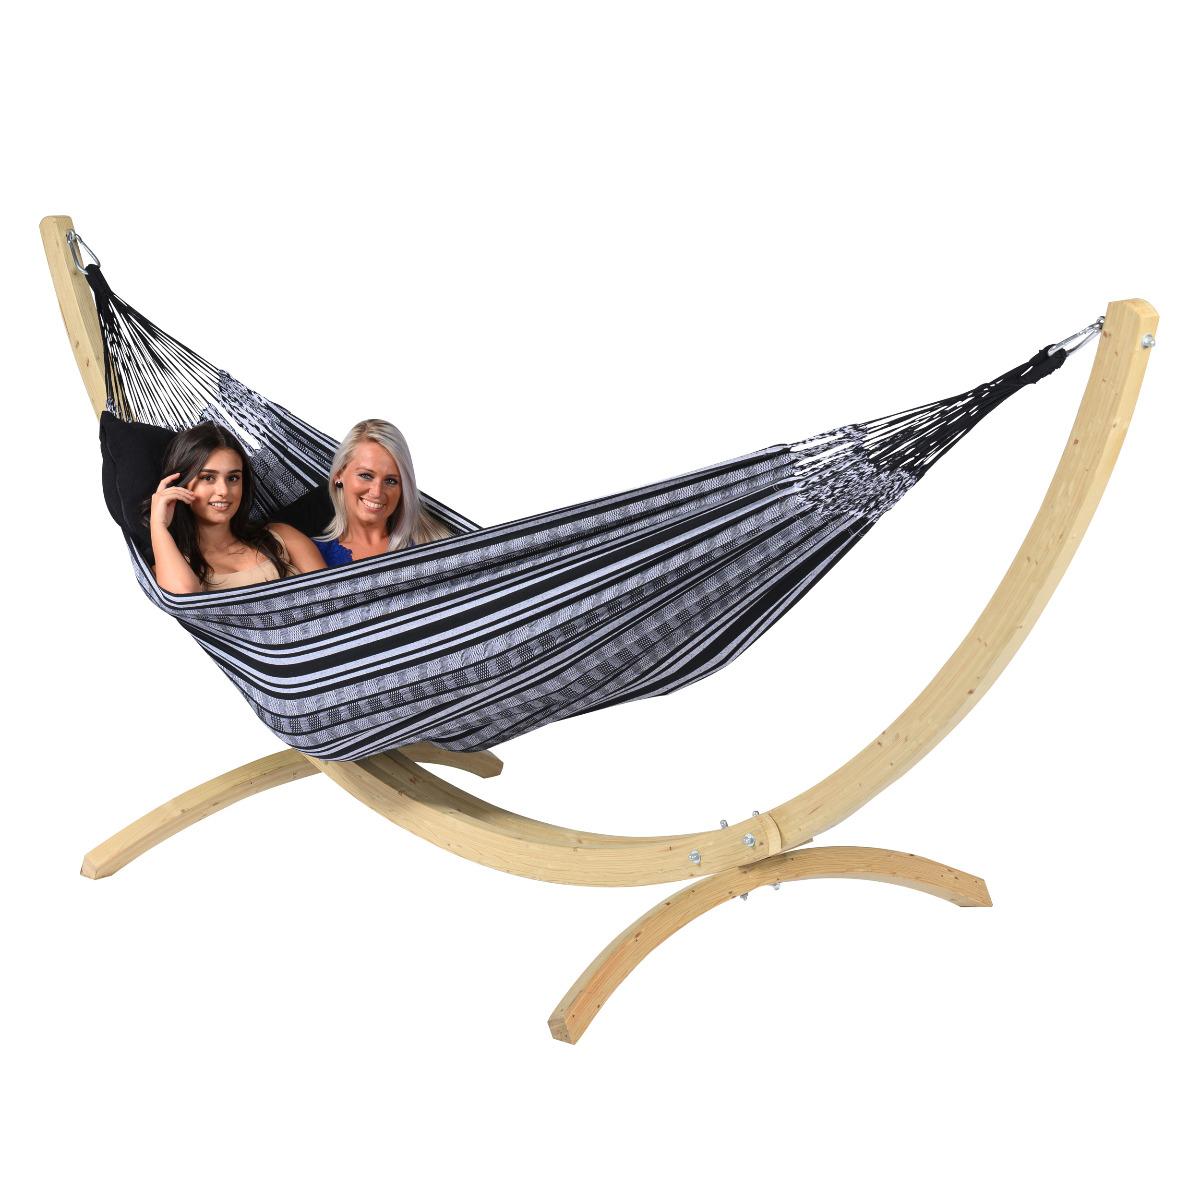 Hangmat 'Comfort' Black White - Tropilex �